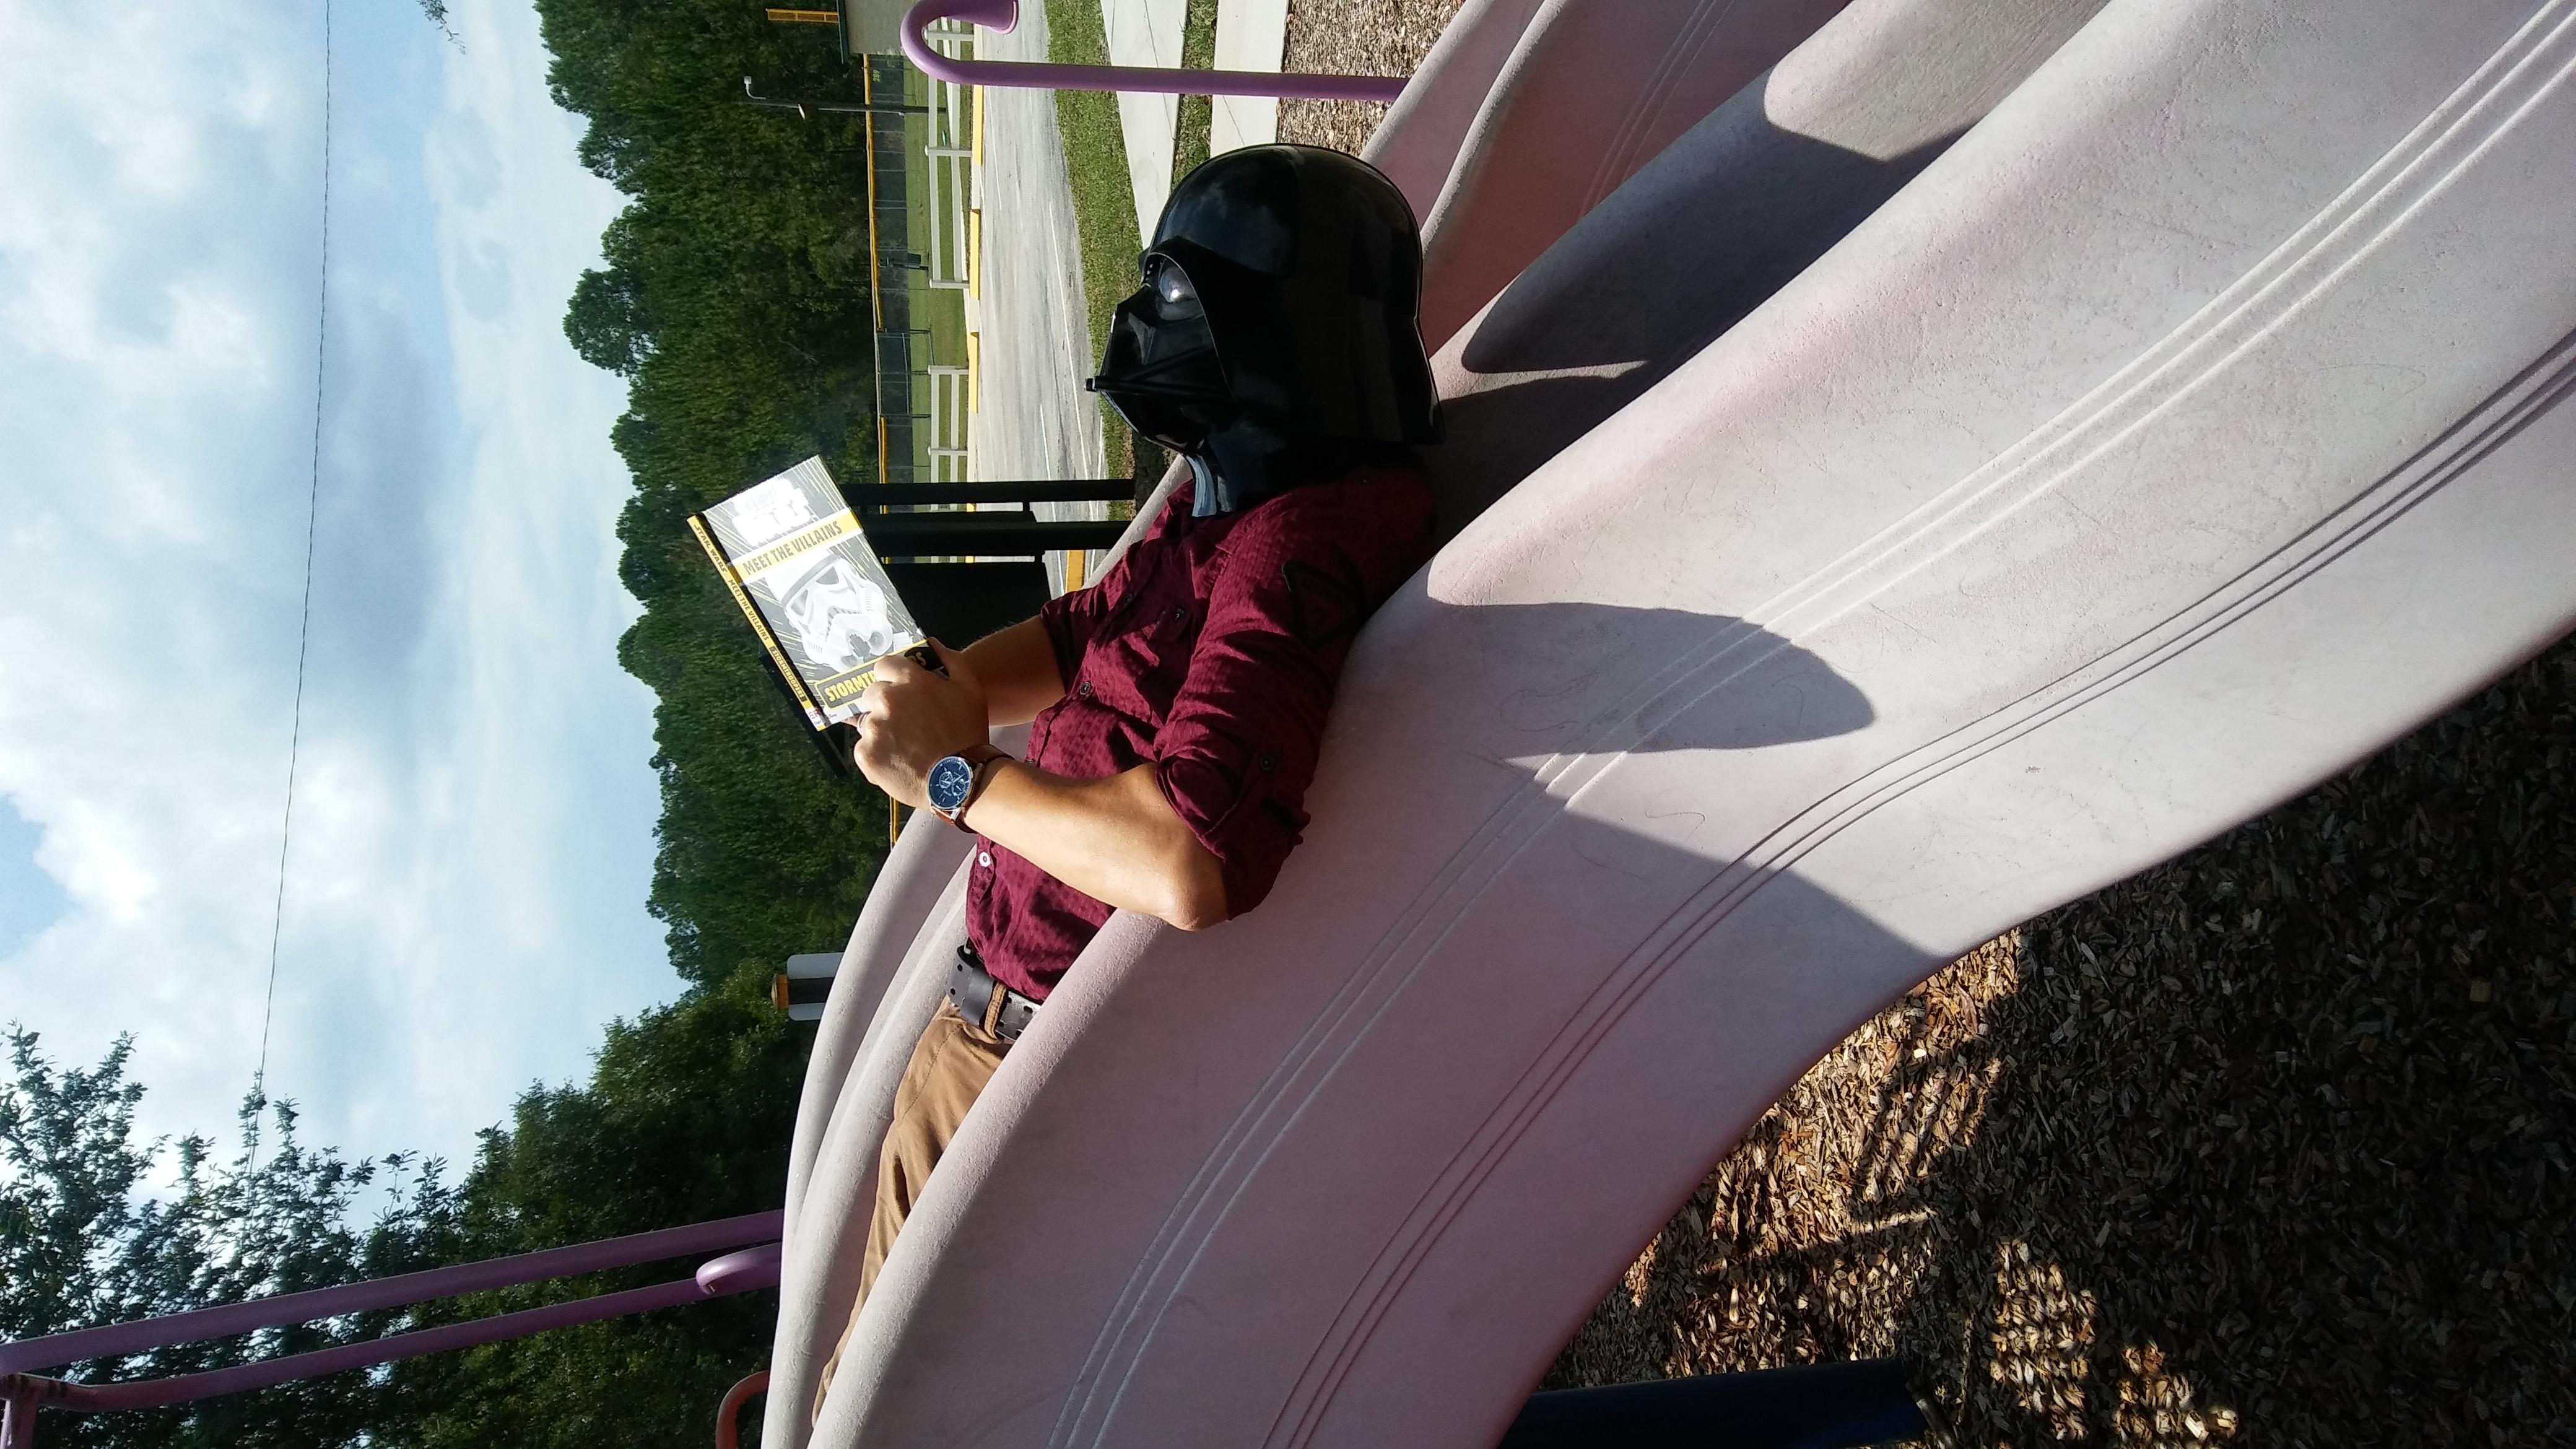 Darth Vader reading on a playground slide